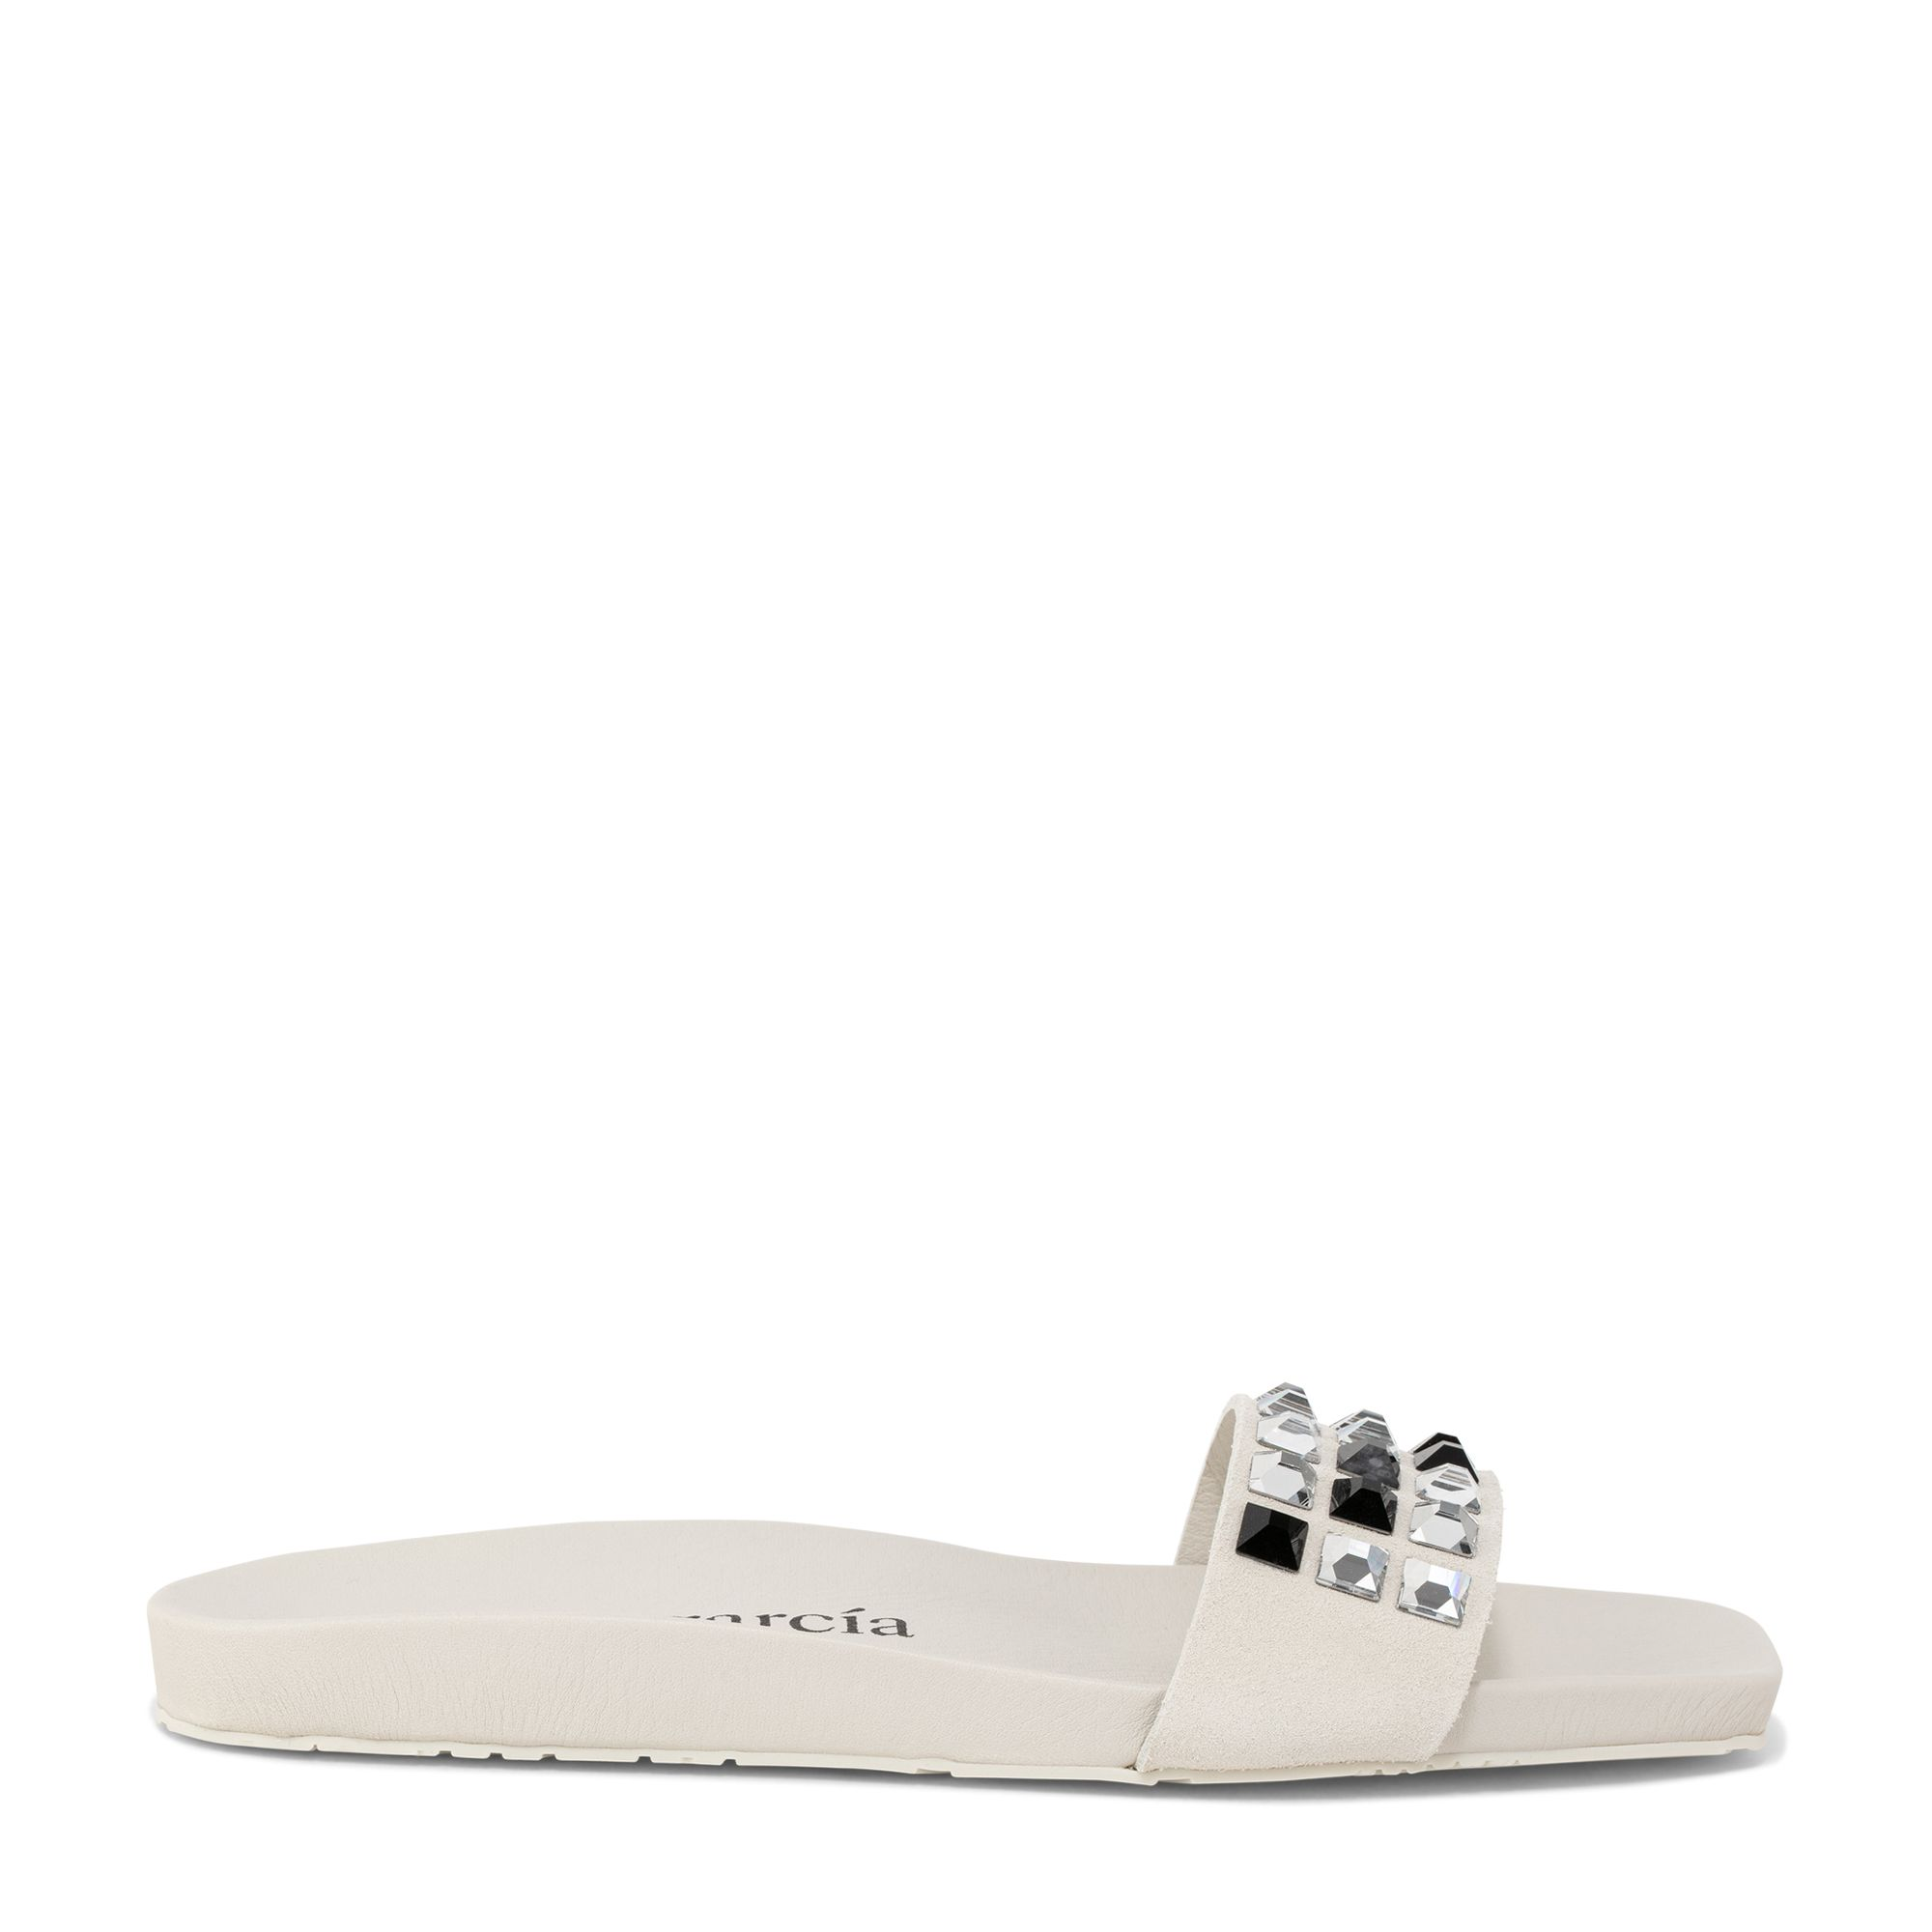 Claid slide sandals